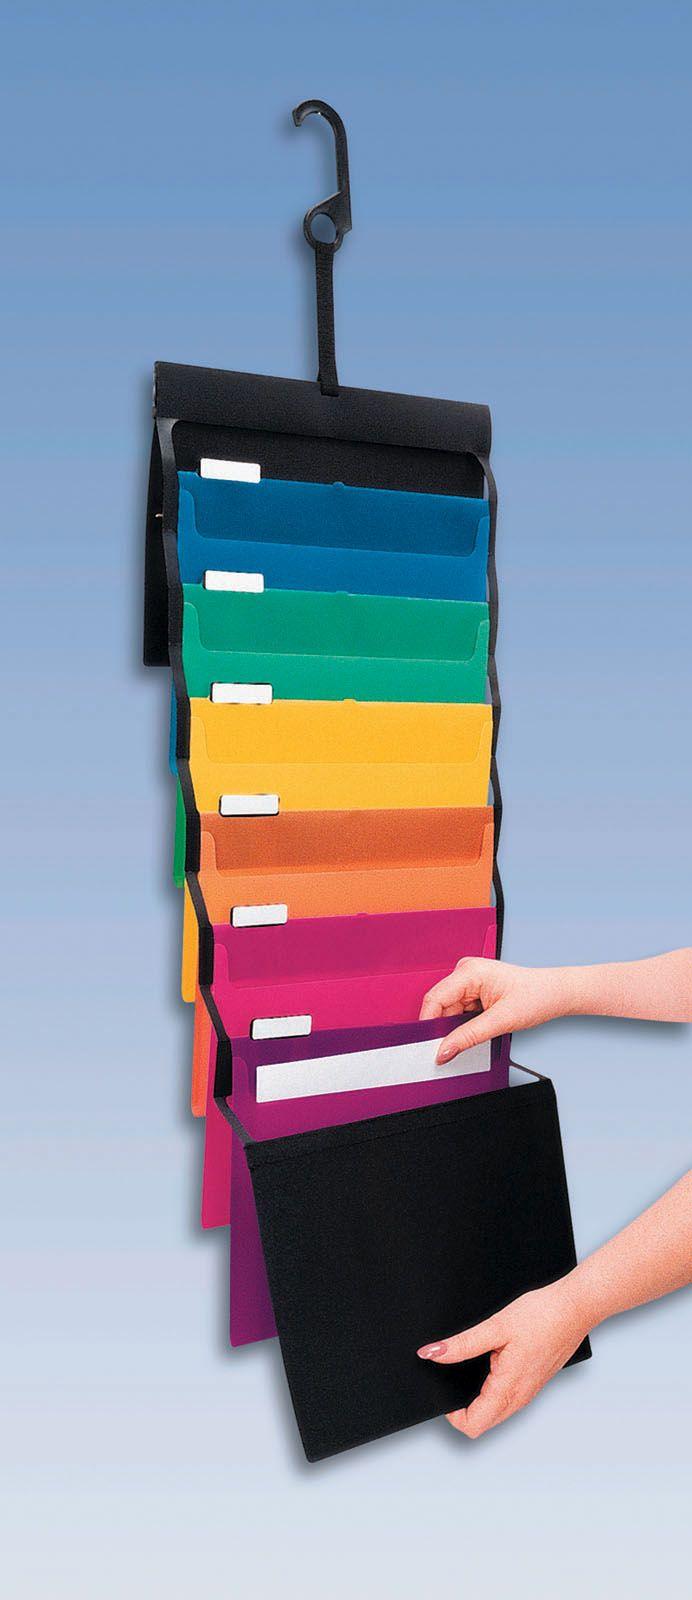 Pendaflex desk free hanging organizer great visual - Hanging desk organizer ...